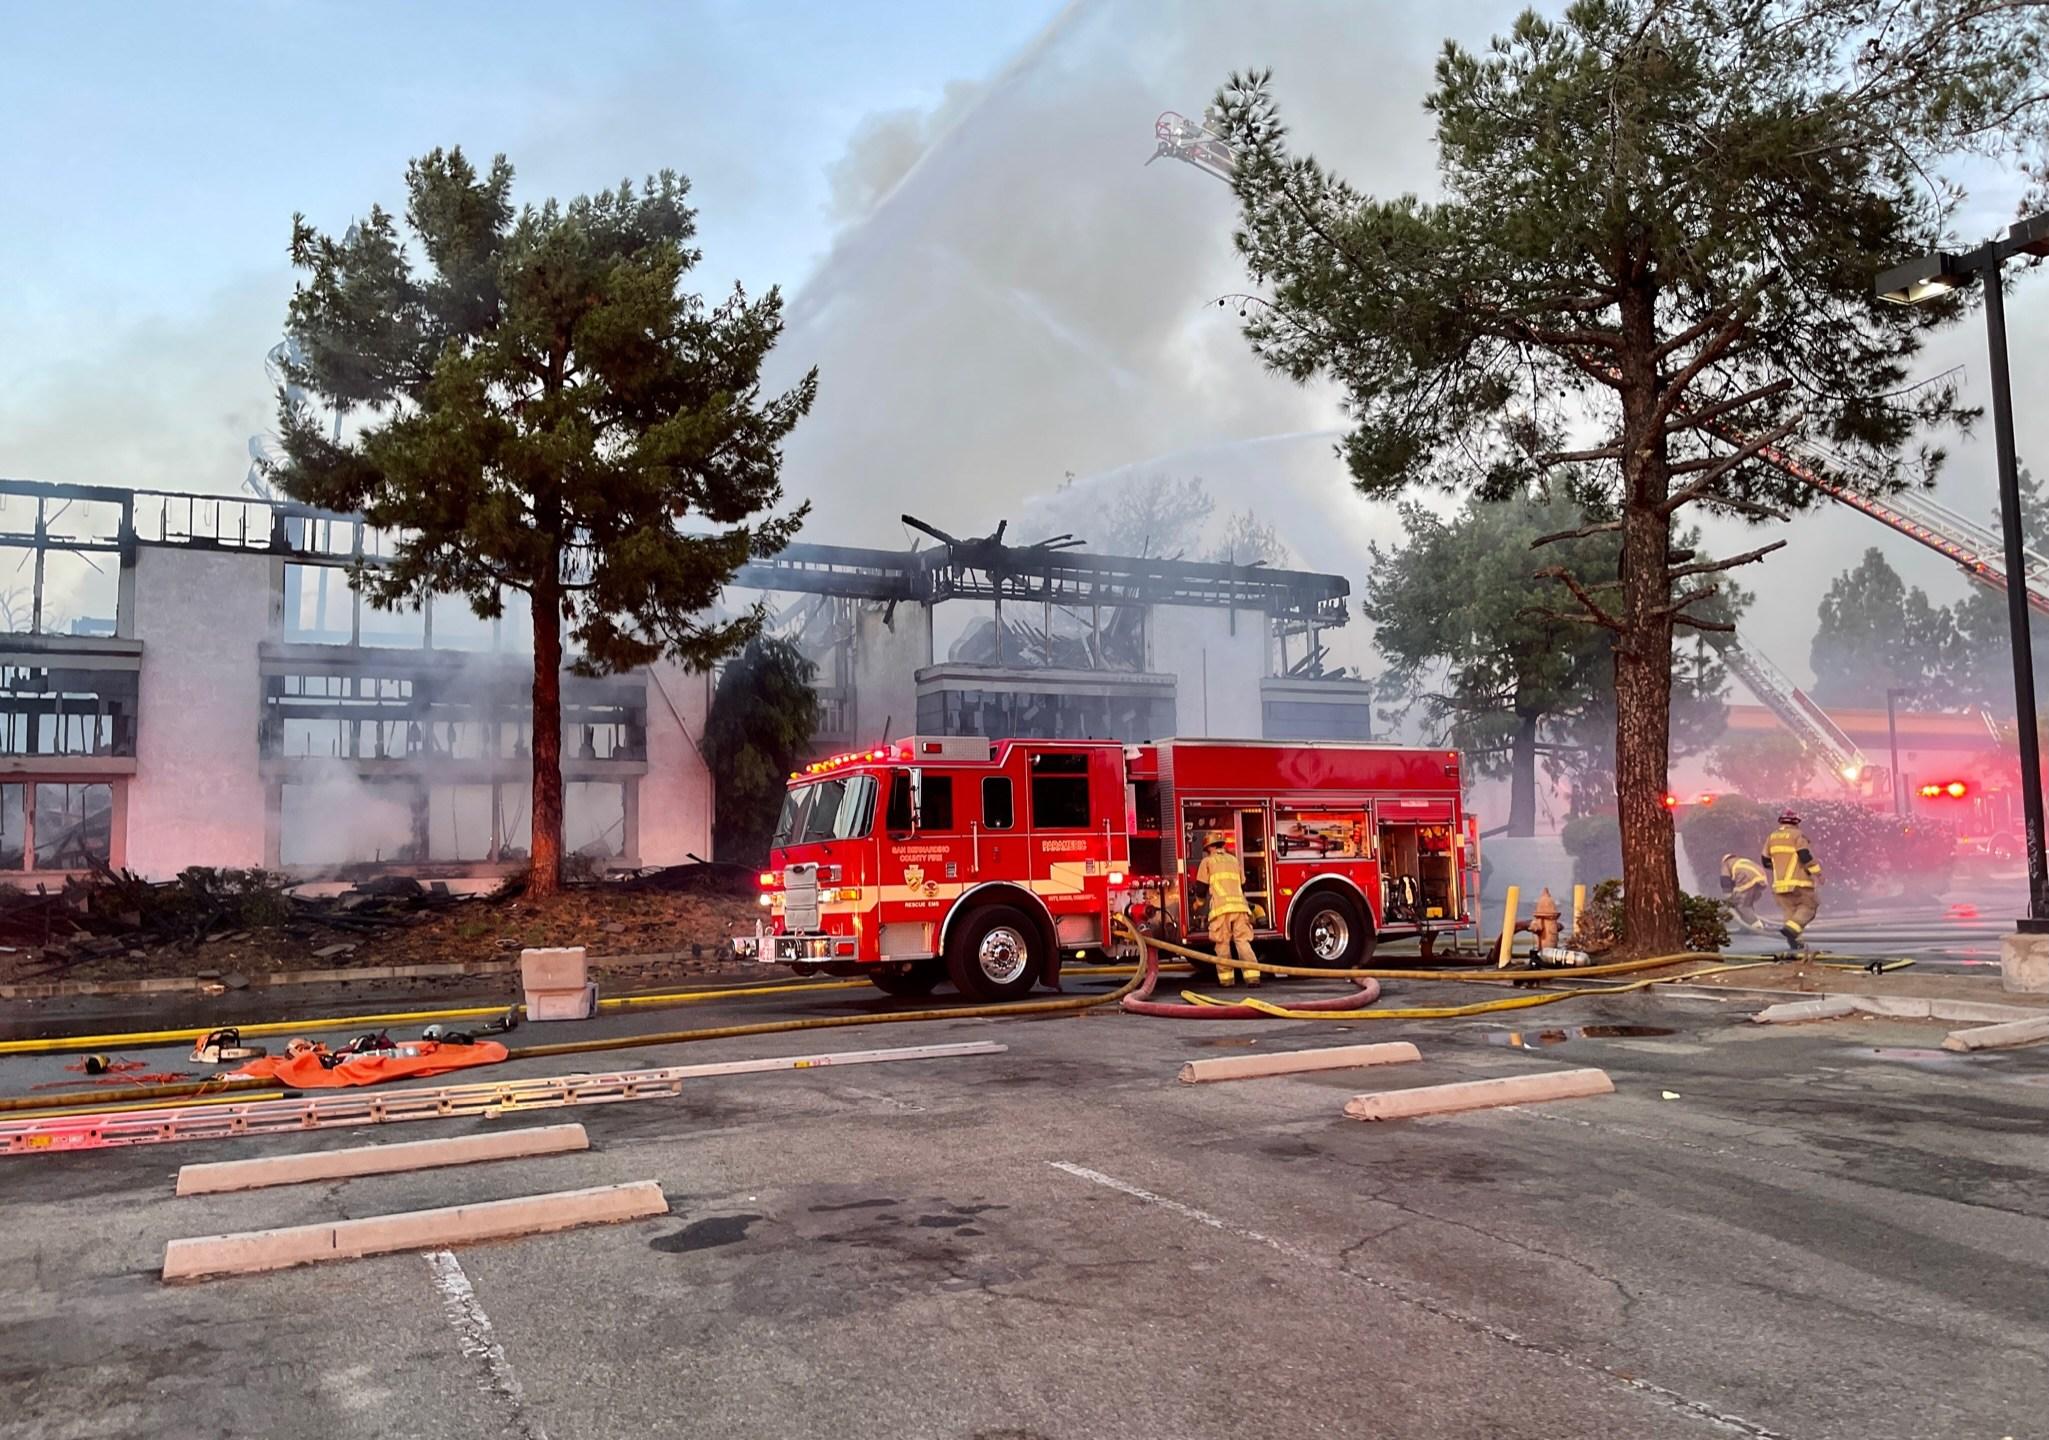 A San Bernardino office building suffered severe damage from a fire on Oct. 3, 2021. (SBCFPD)